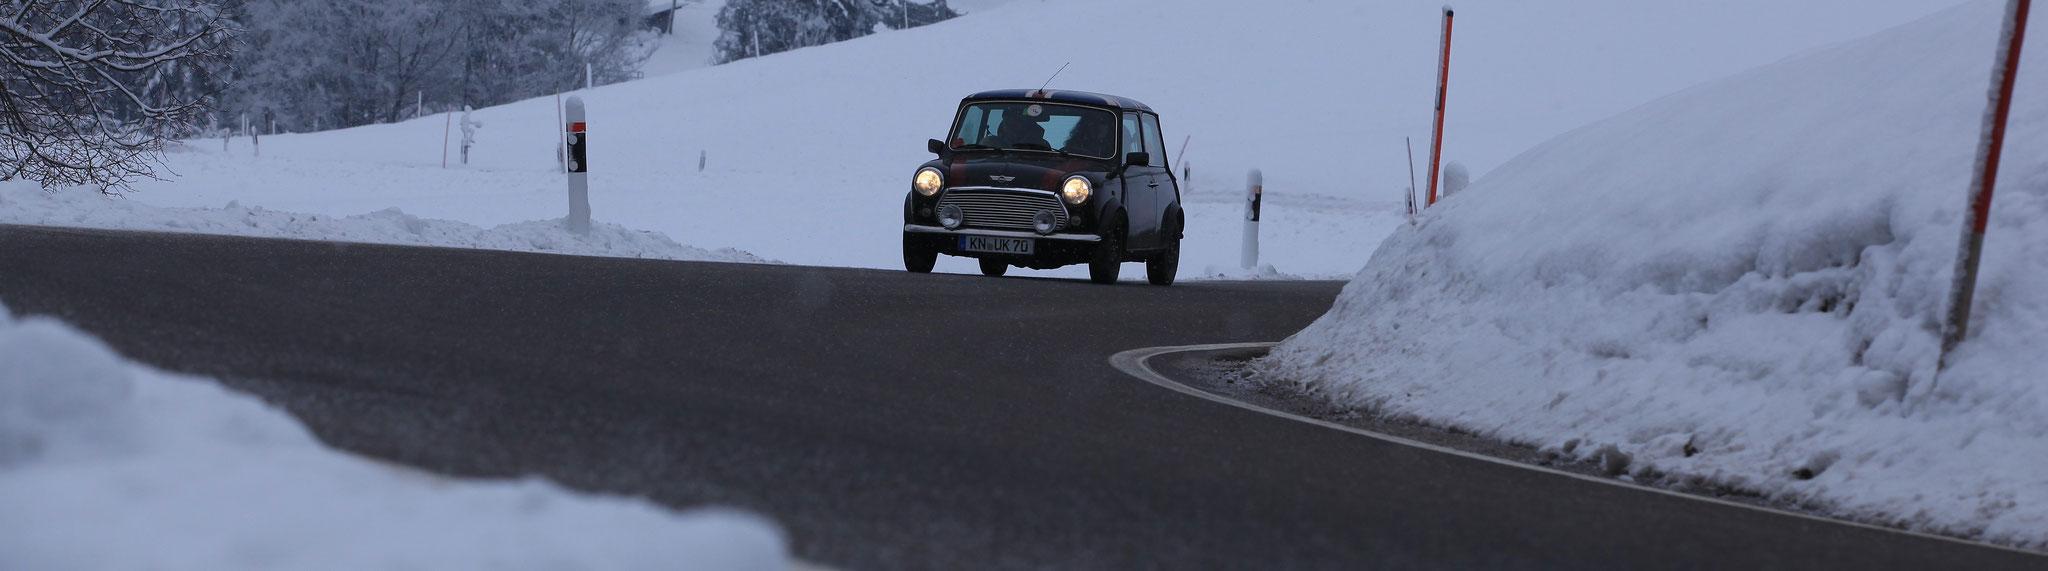 Oldtimerrallyes Bodensee Reisen, Rallyes & mehr …